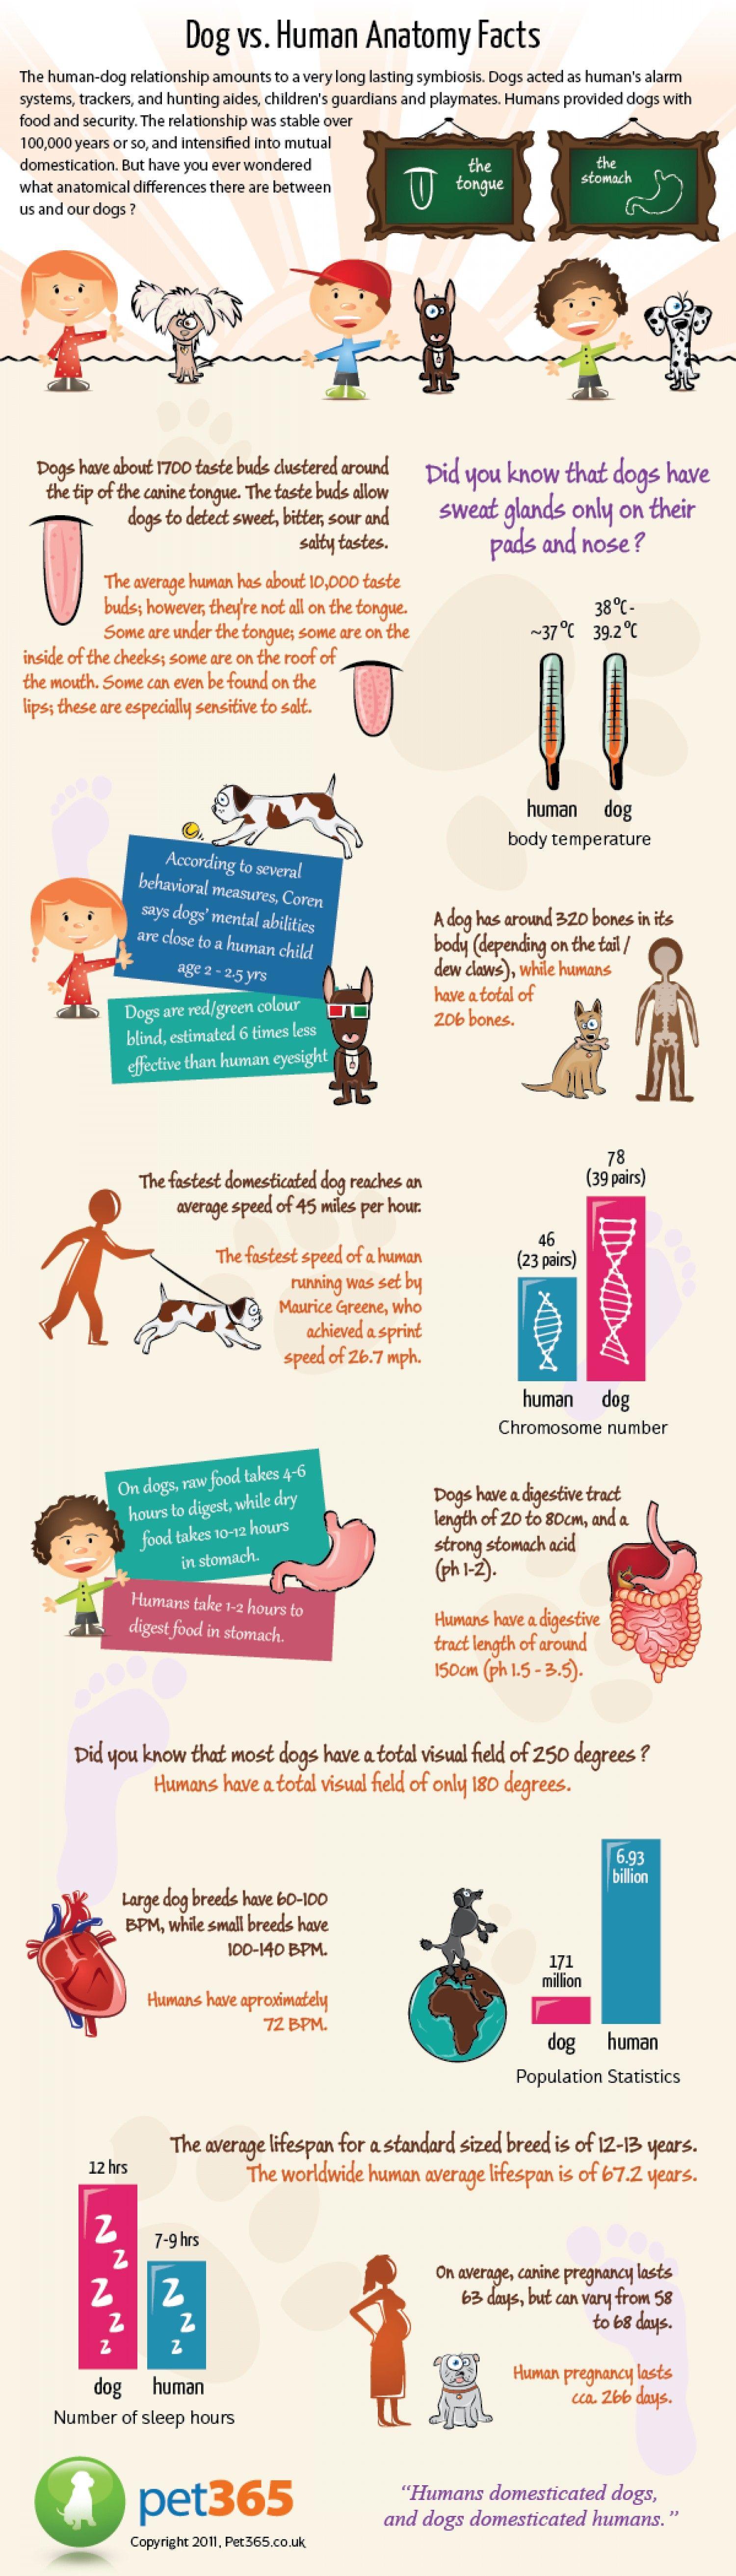 Dog vs Human Anatomy Infographic | For Zoe | Pinterest | Human ...